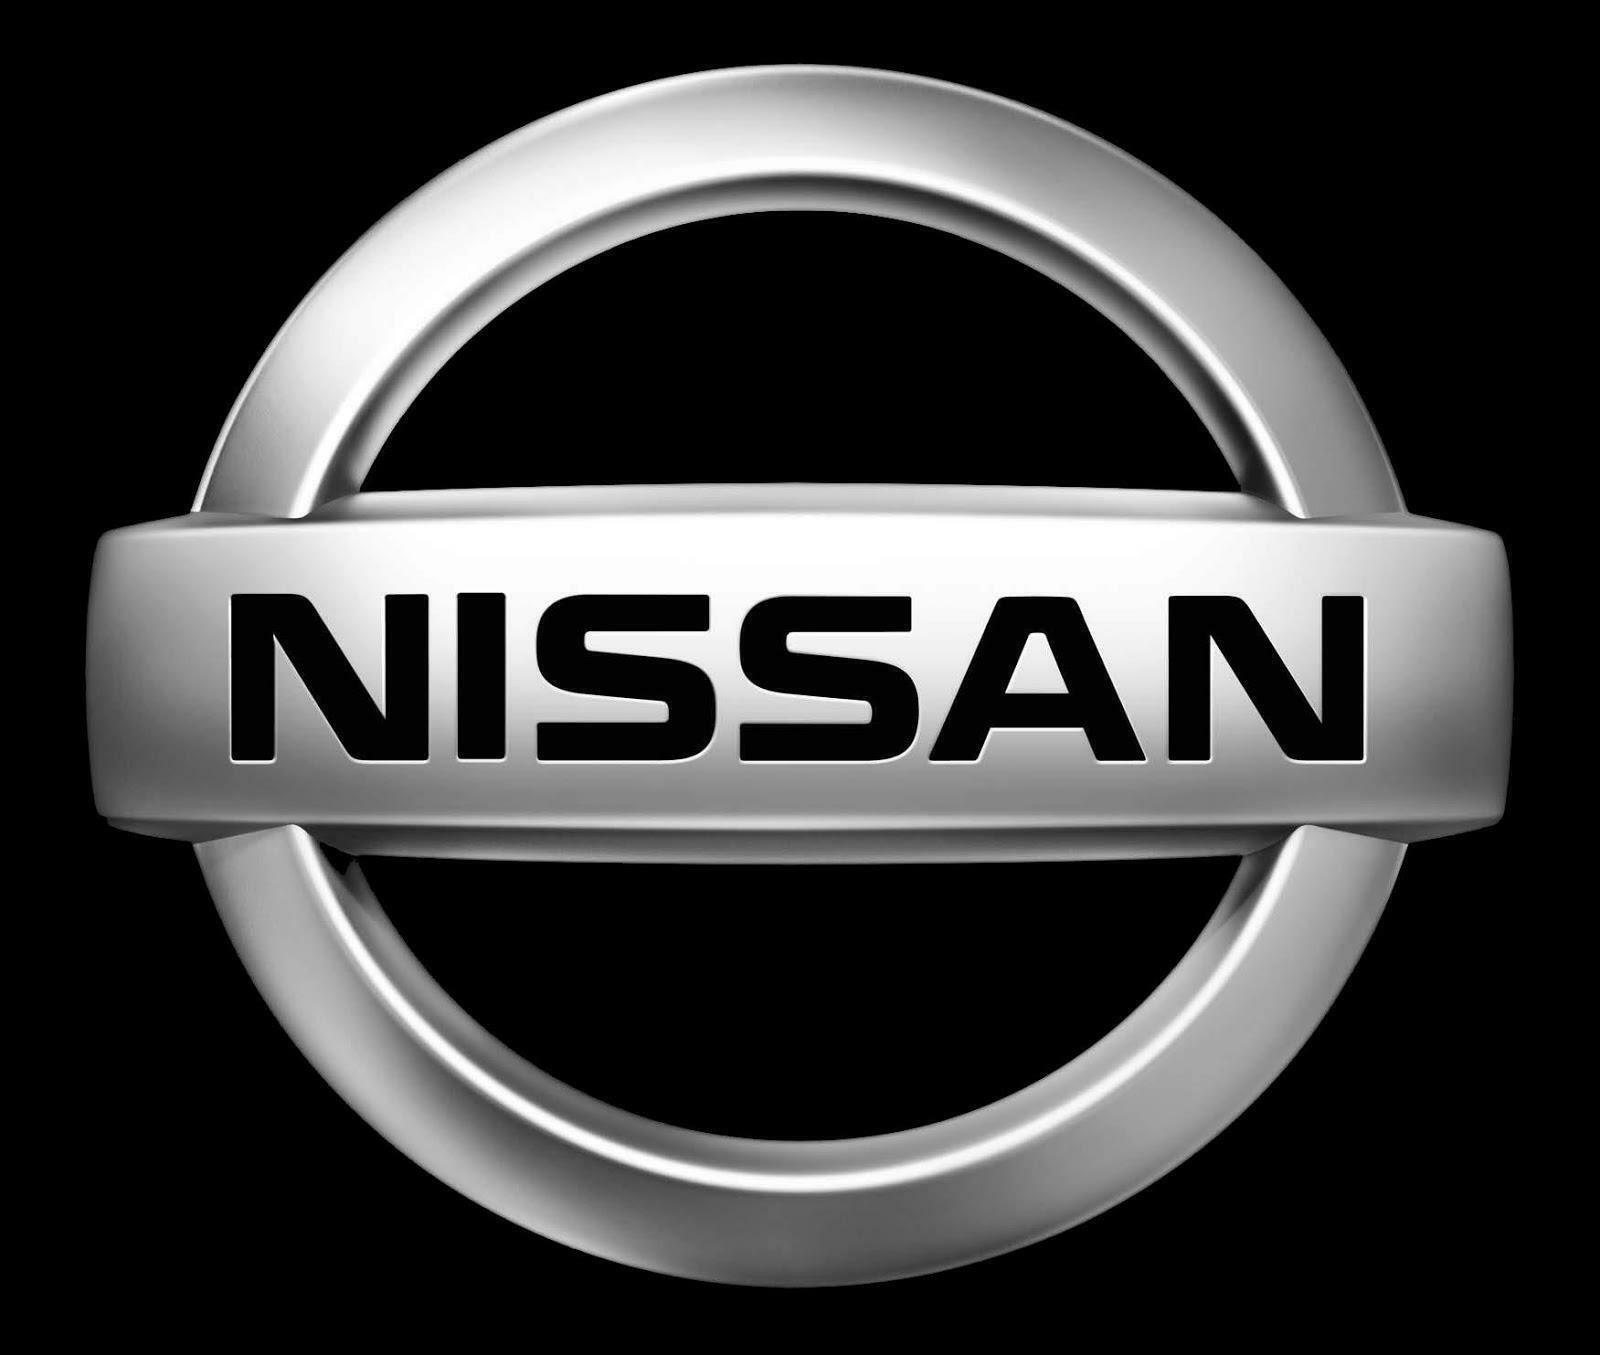 NEW Genuine Nissan Nut OEM 01221-00341